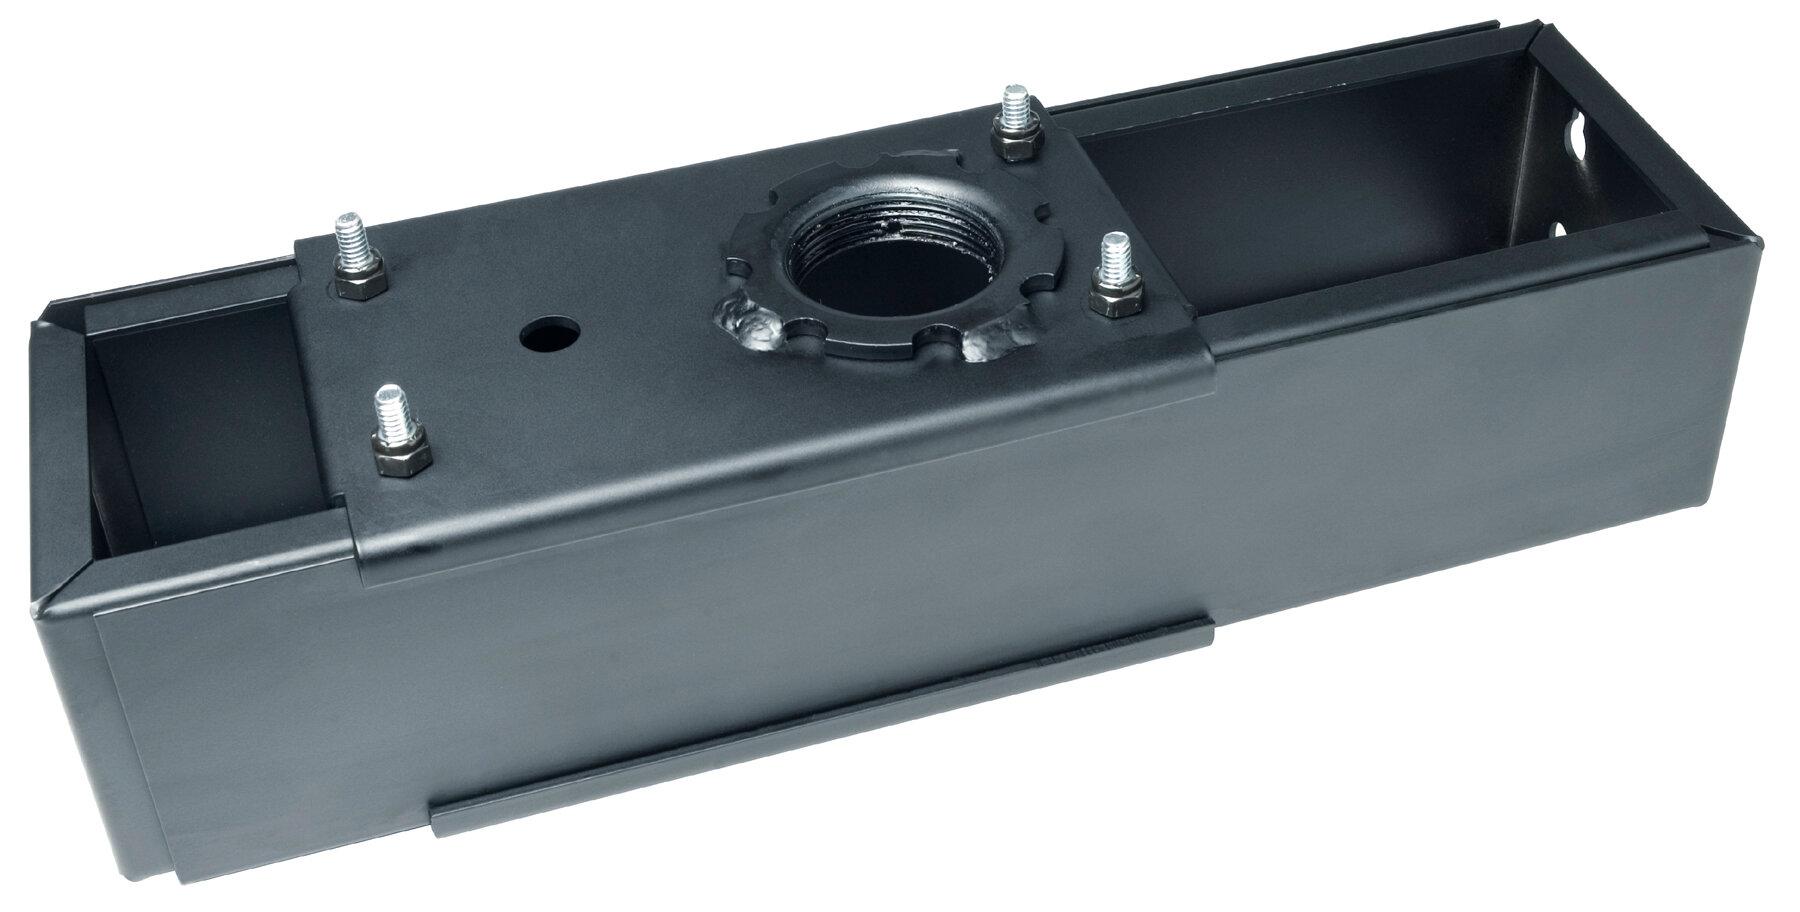 Peerless-AV Peerless TV and Projector Ceiling Mounts and Parts ...